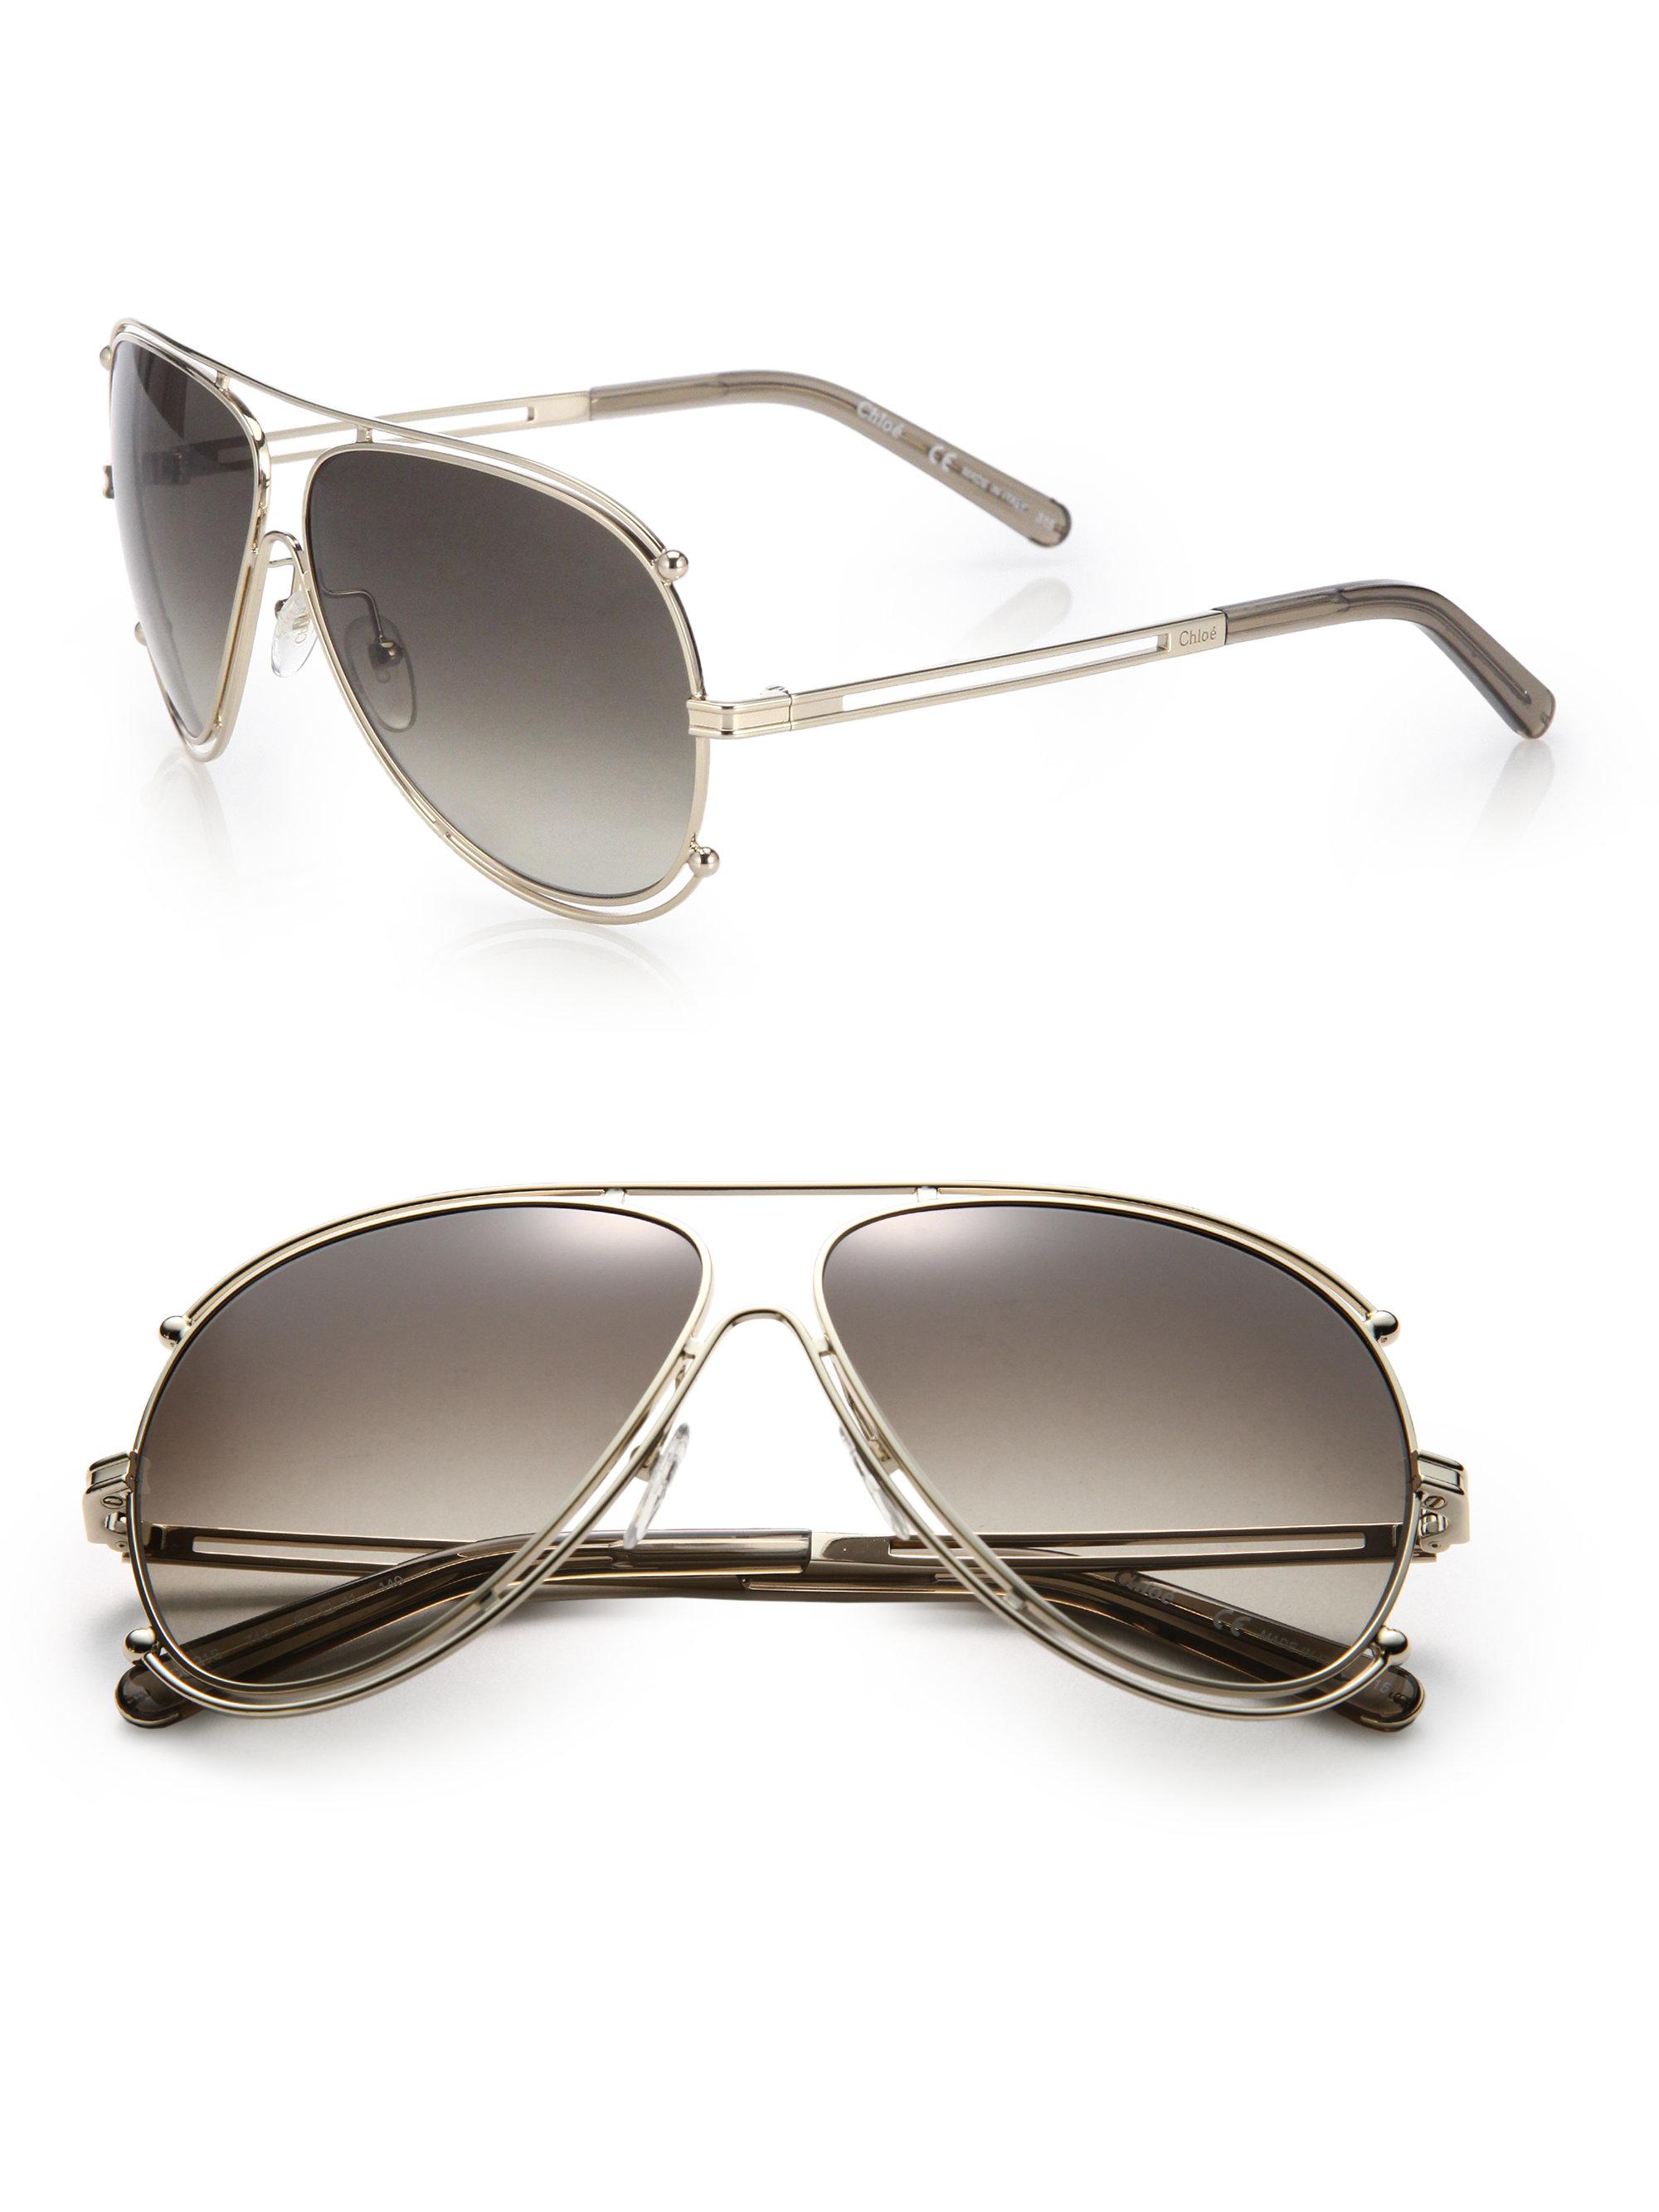 Chloe Gold Frame Sunglasses : Chloe Isadora 61mm Aviator Sunglasses in Metallic Lyst